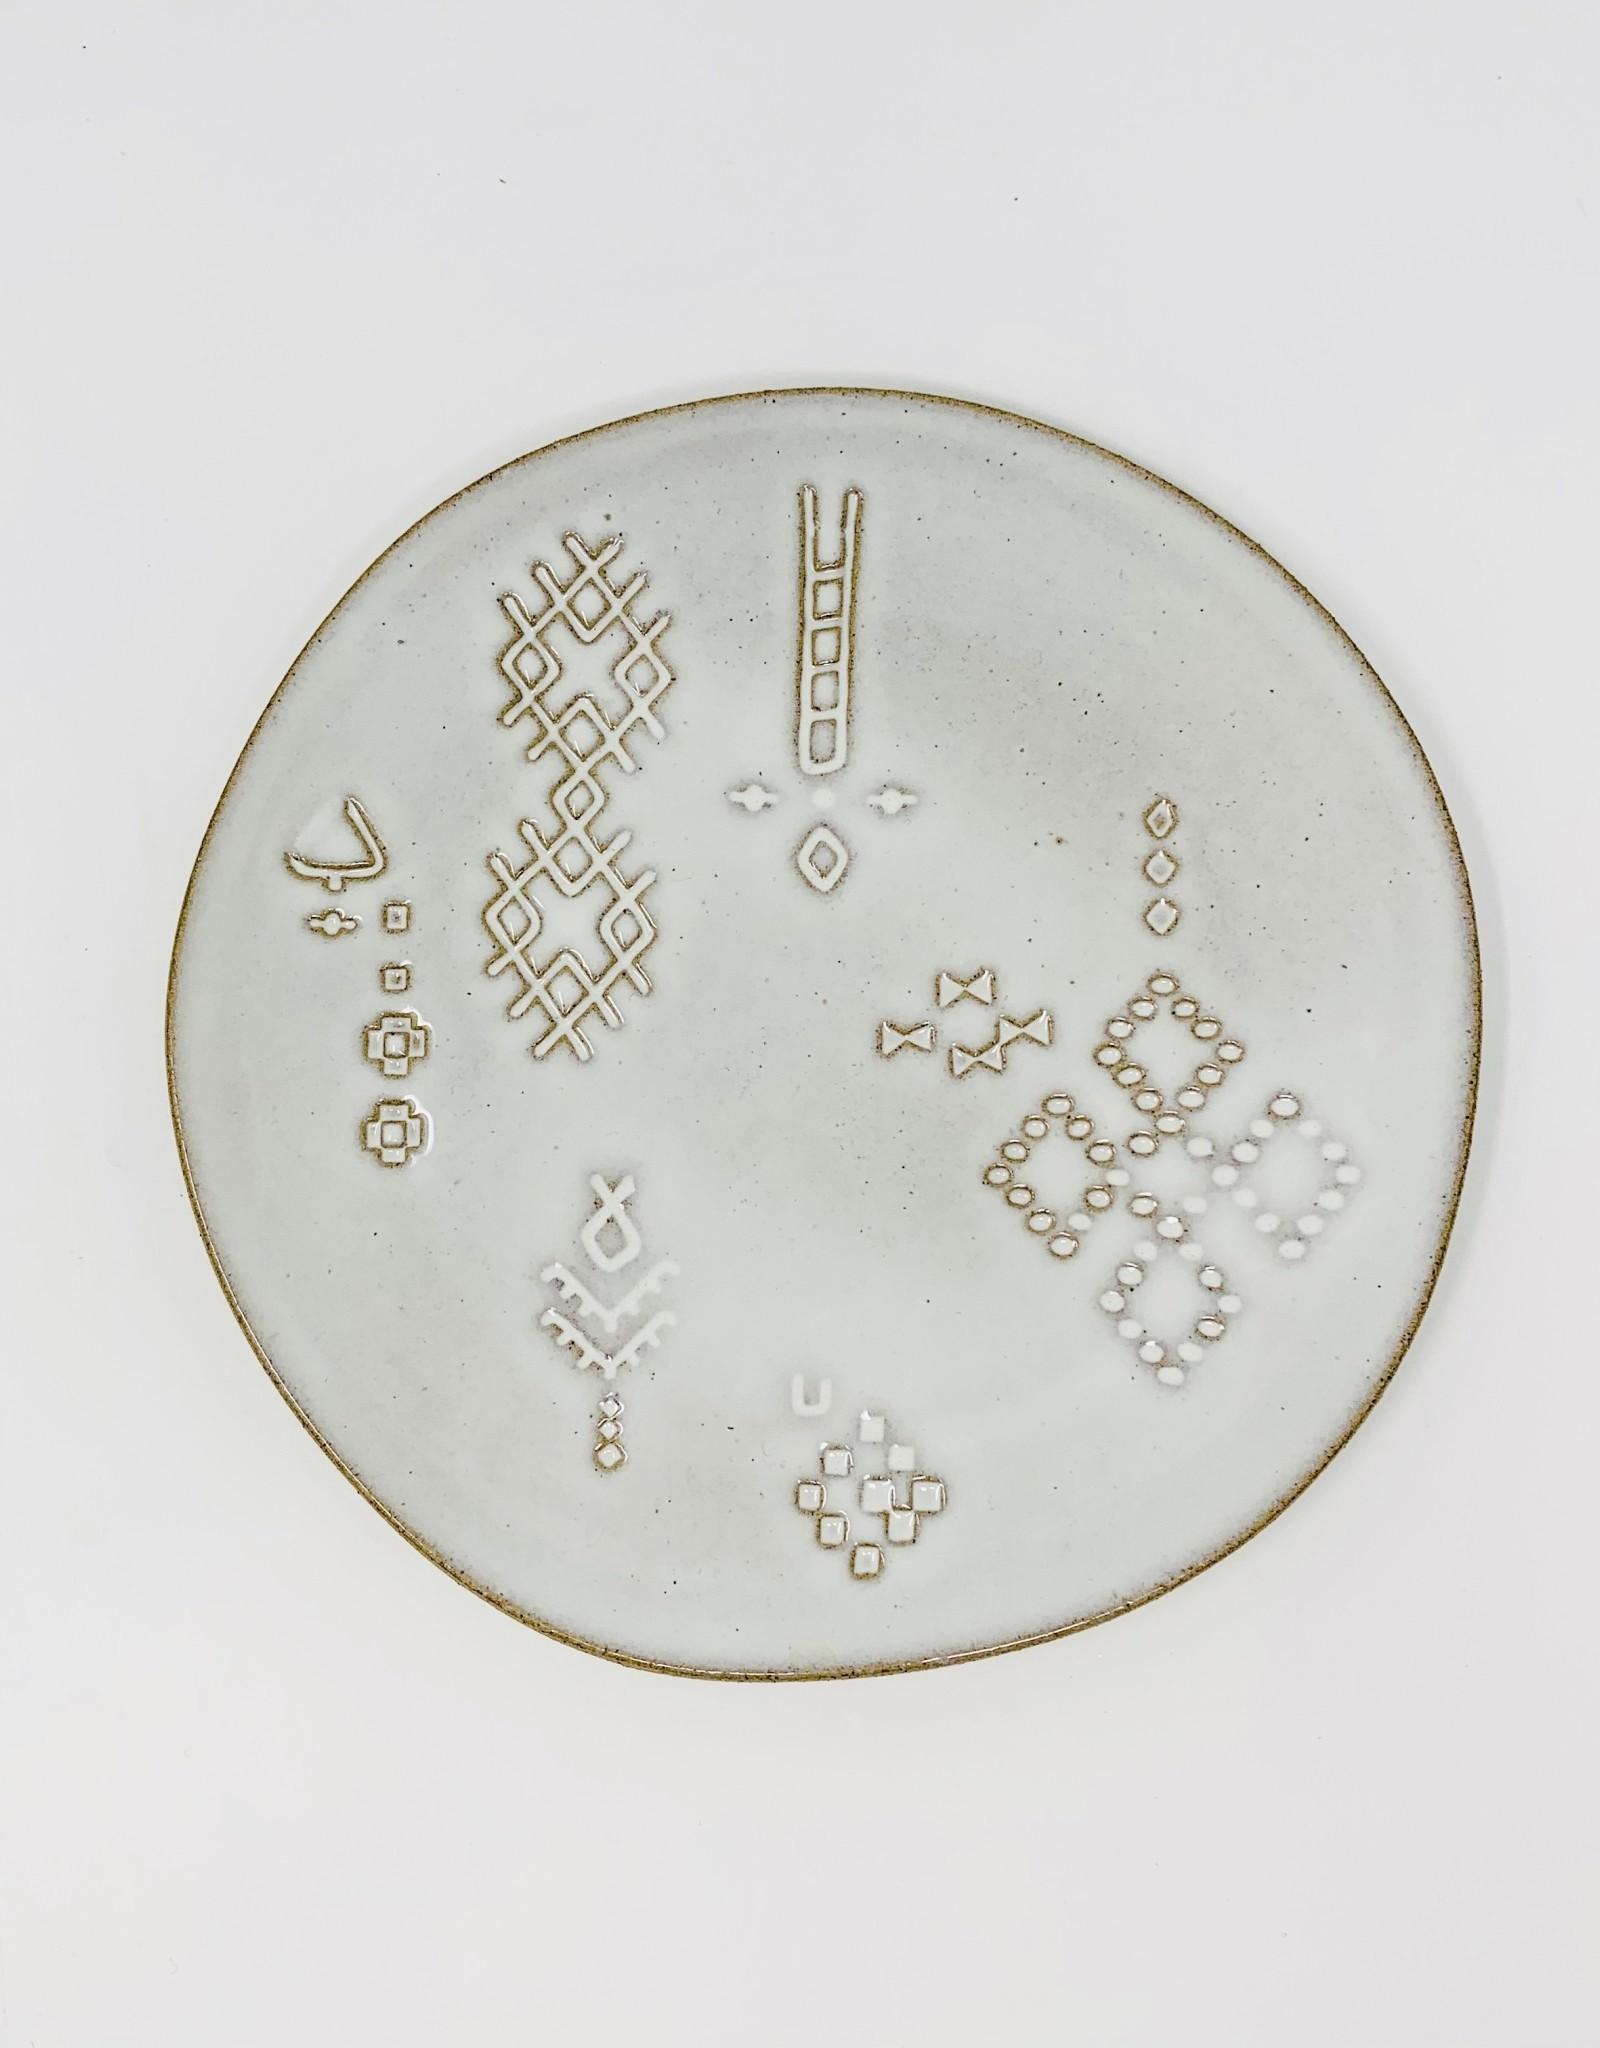 Fringe Marks white Stoneware dessert plate